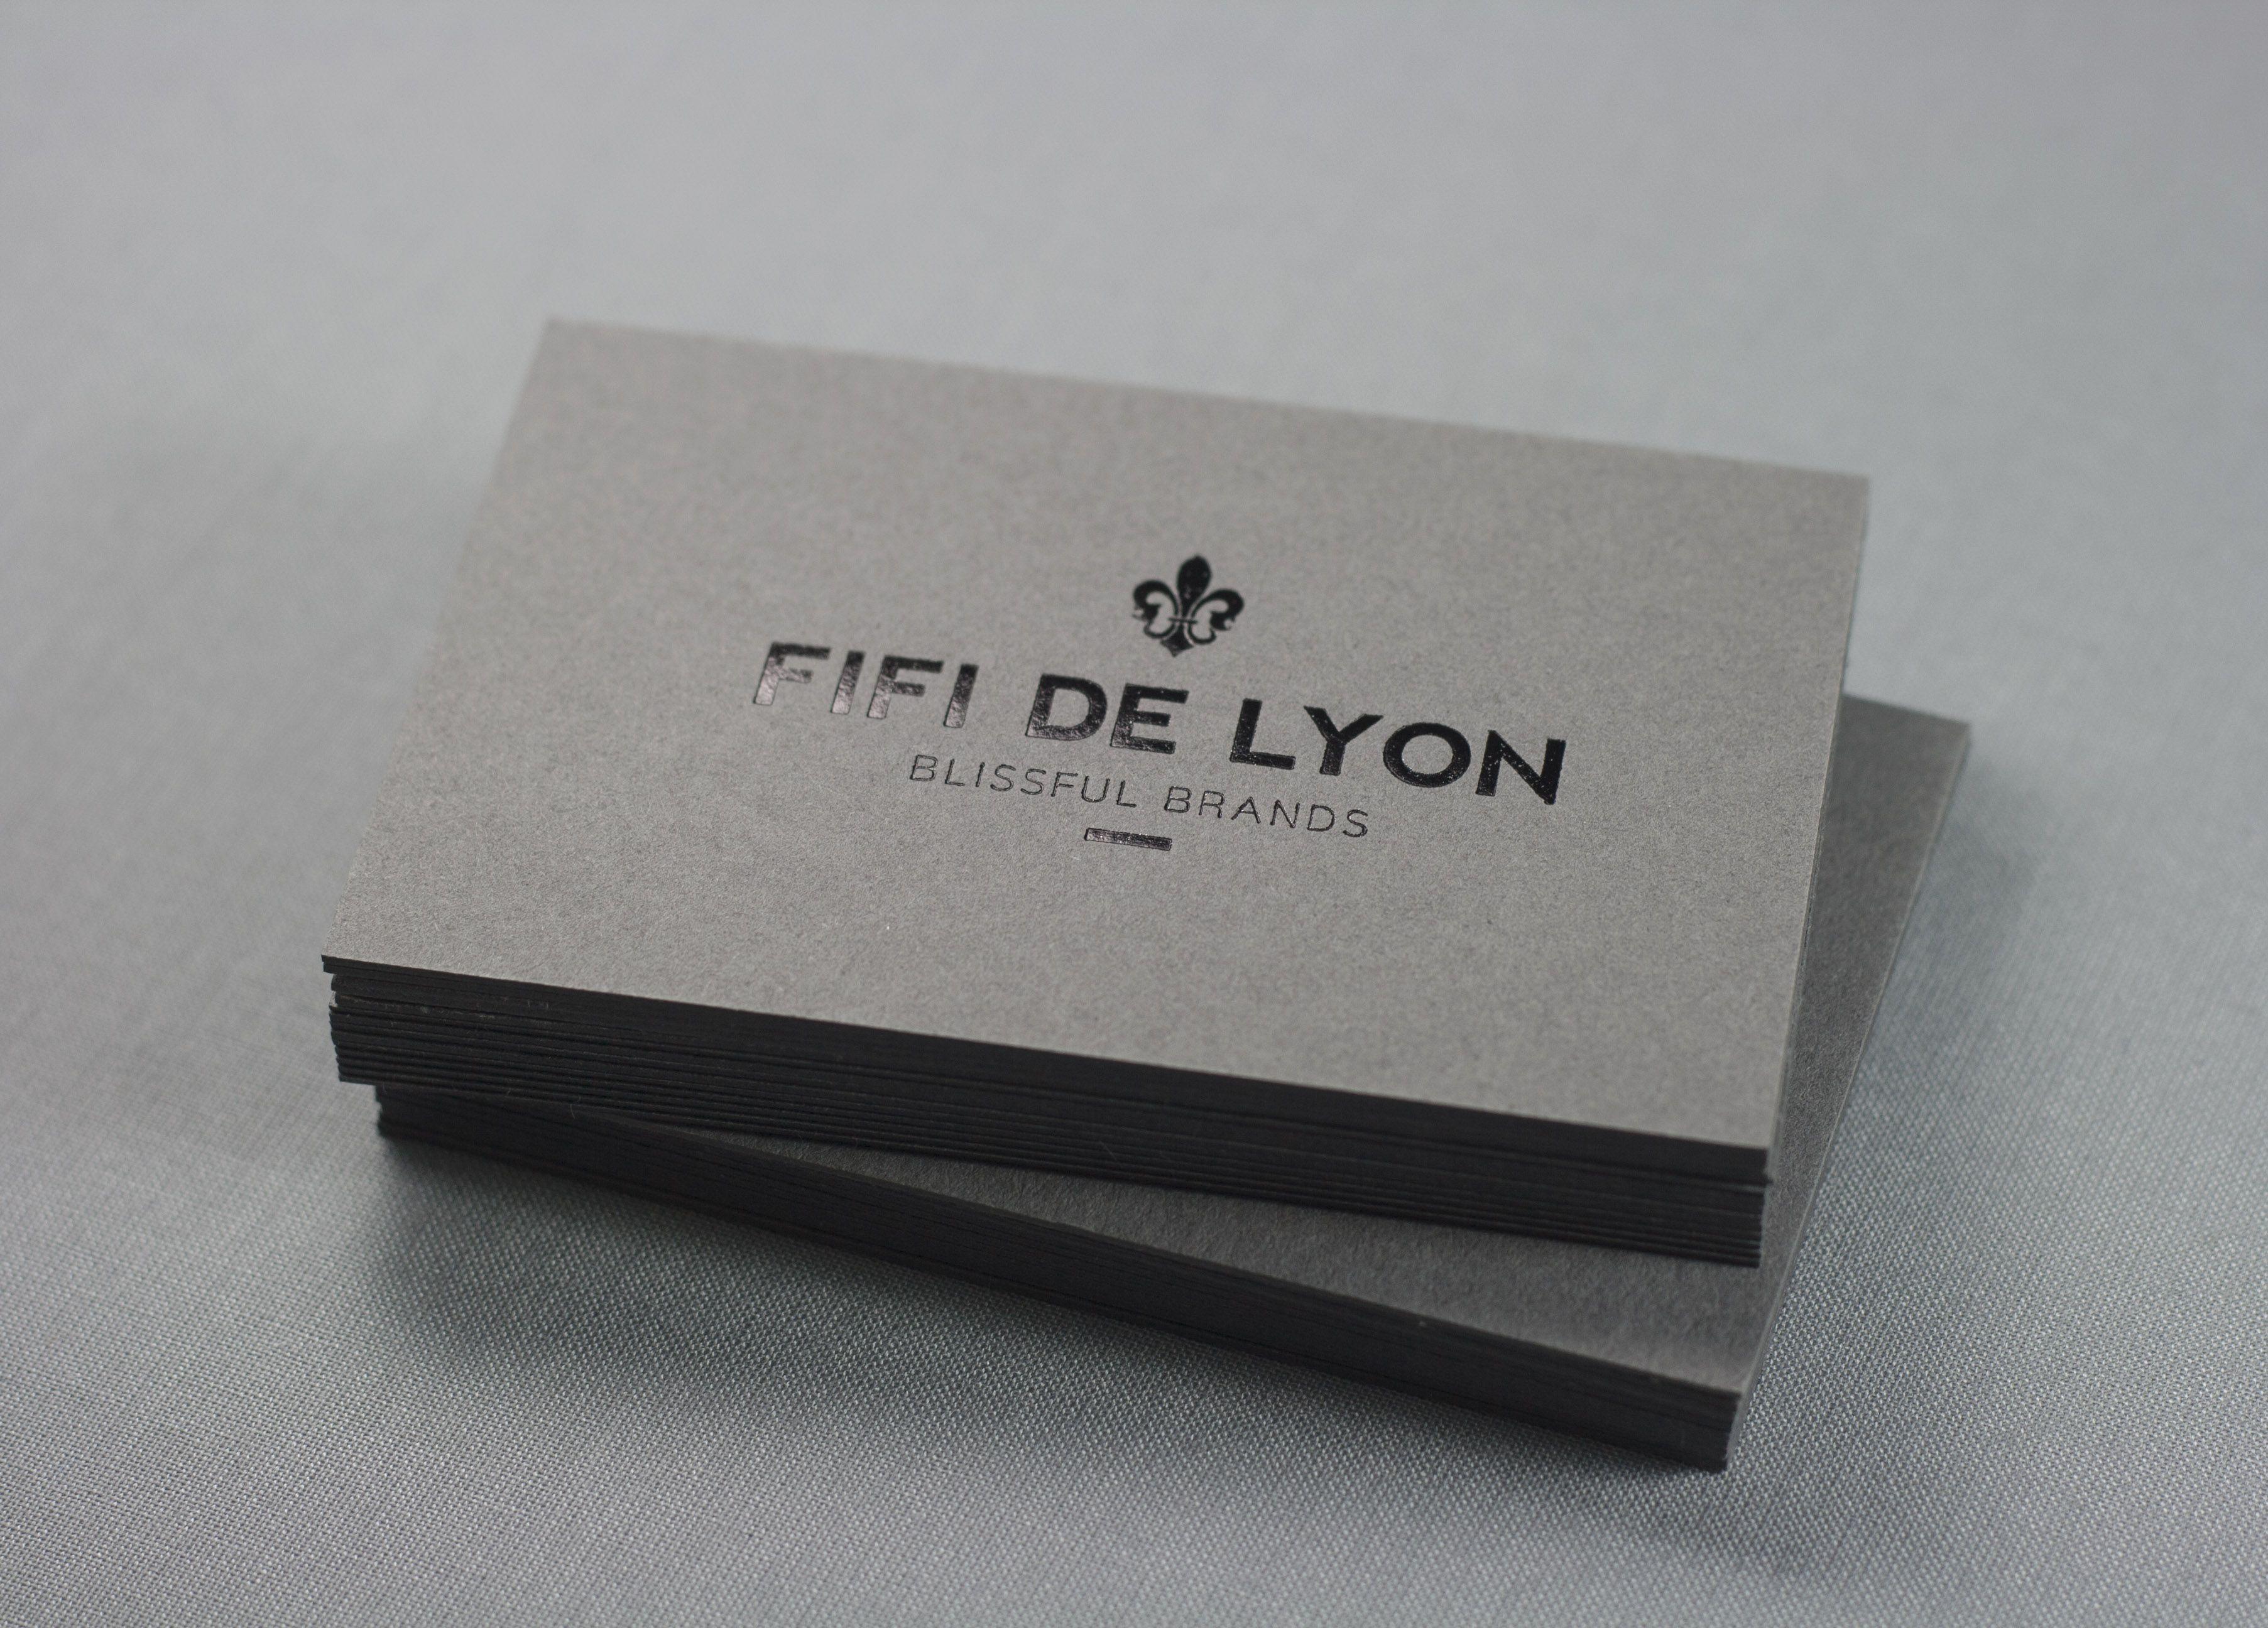 Simple Design Business Cards Black Foil On Grey Paper Minimalistic Print Dot Studio Debossed Business Card Embossed Business Cards Graphic Designer Ideas